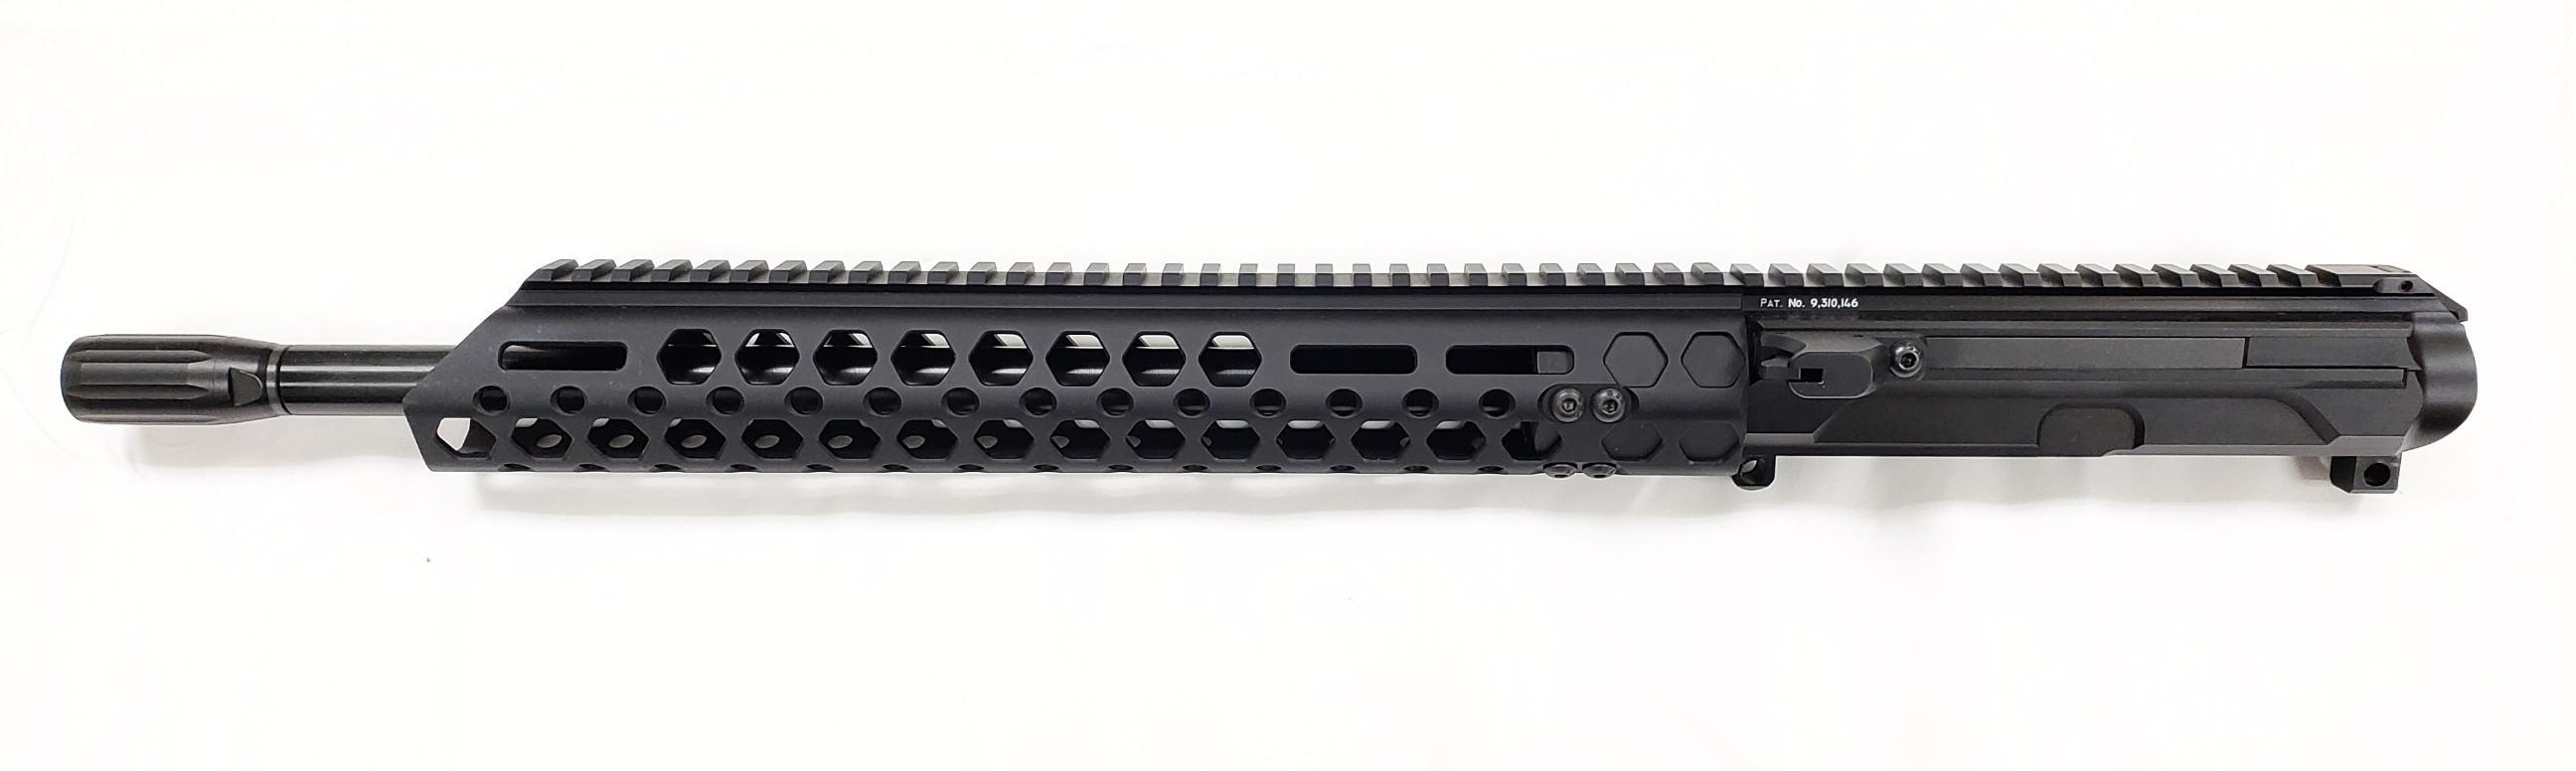 G9 Complete Upper - 16